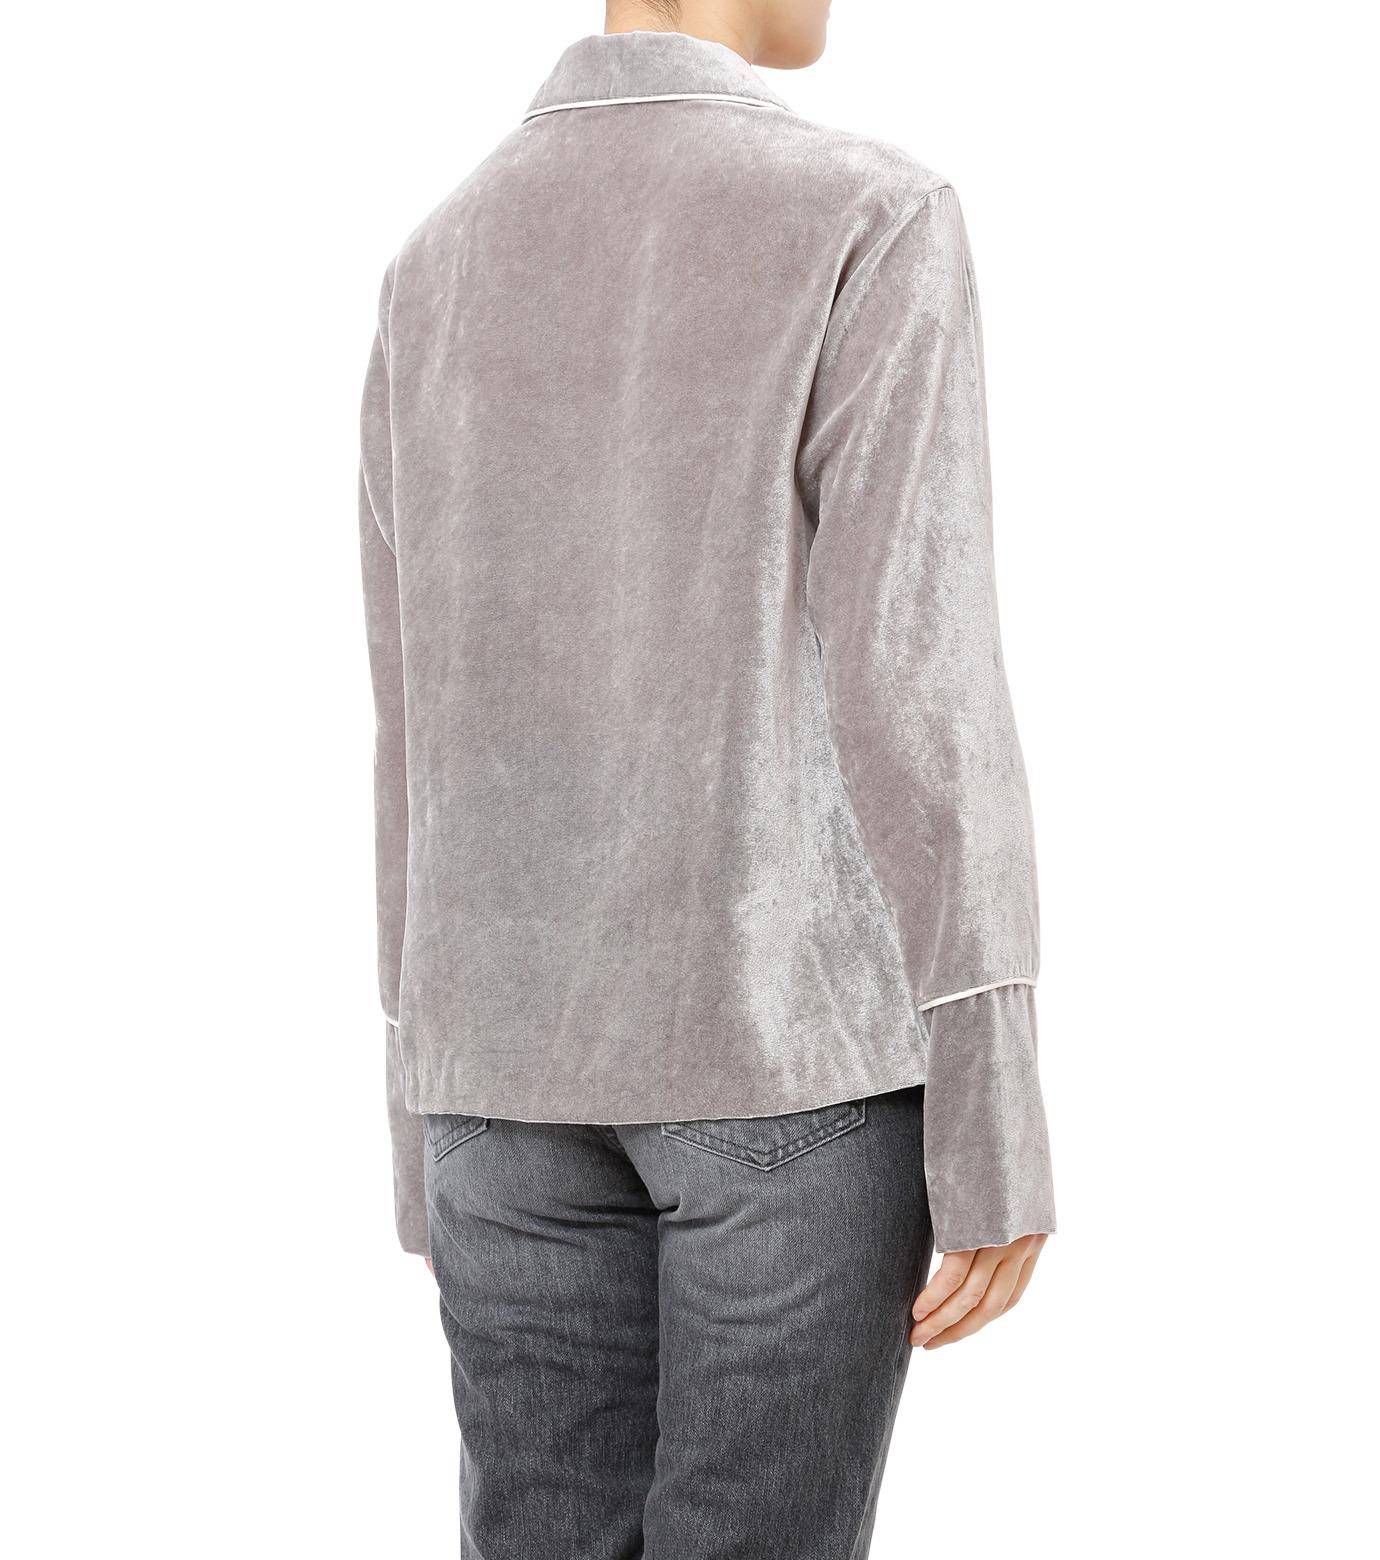 LE CIEL BLEU(ルシェルブルー)のルーズベルベットシャツ-GRAY(シャツ/shirt)-18A63417 拡大詳細画像2